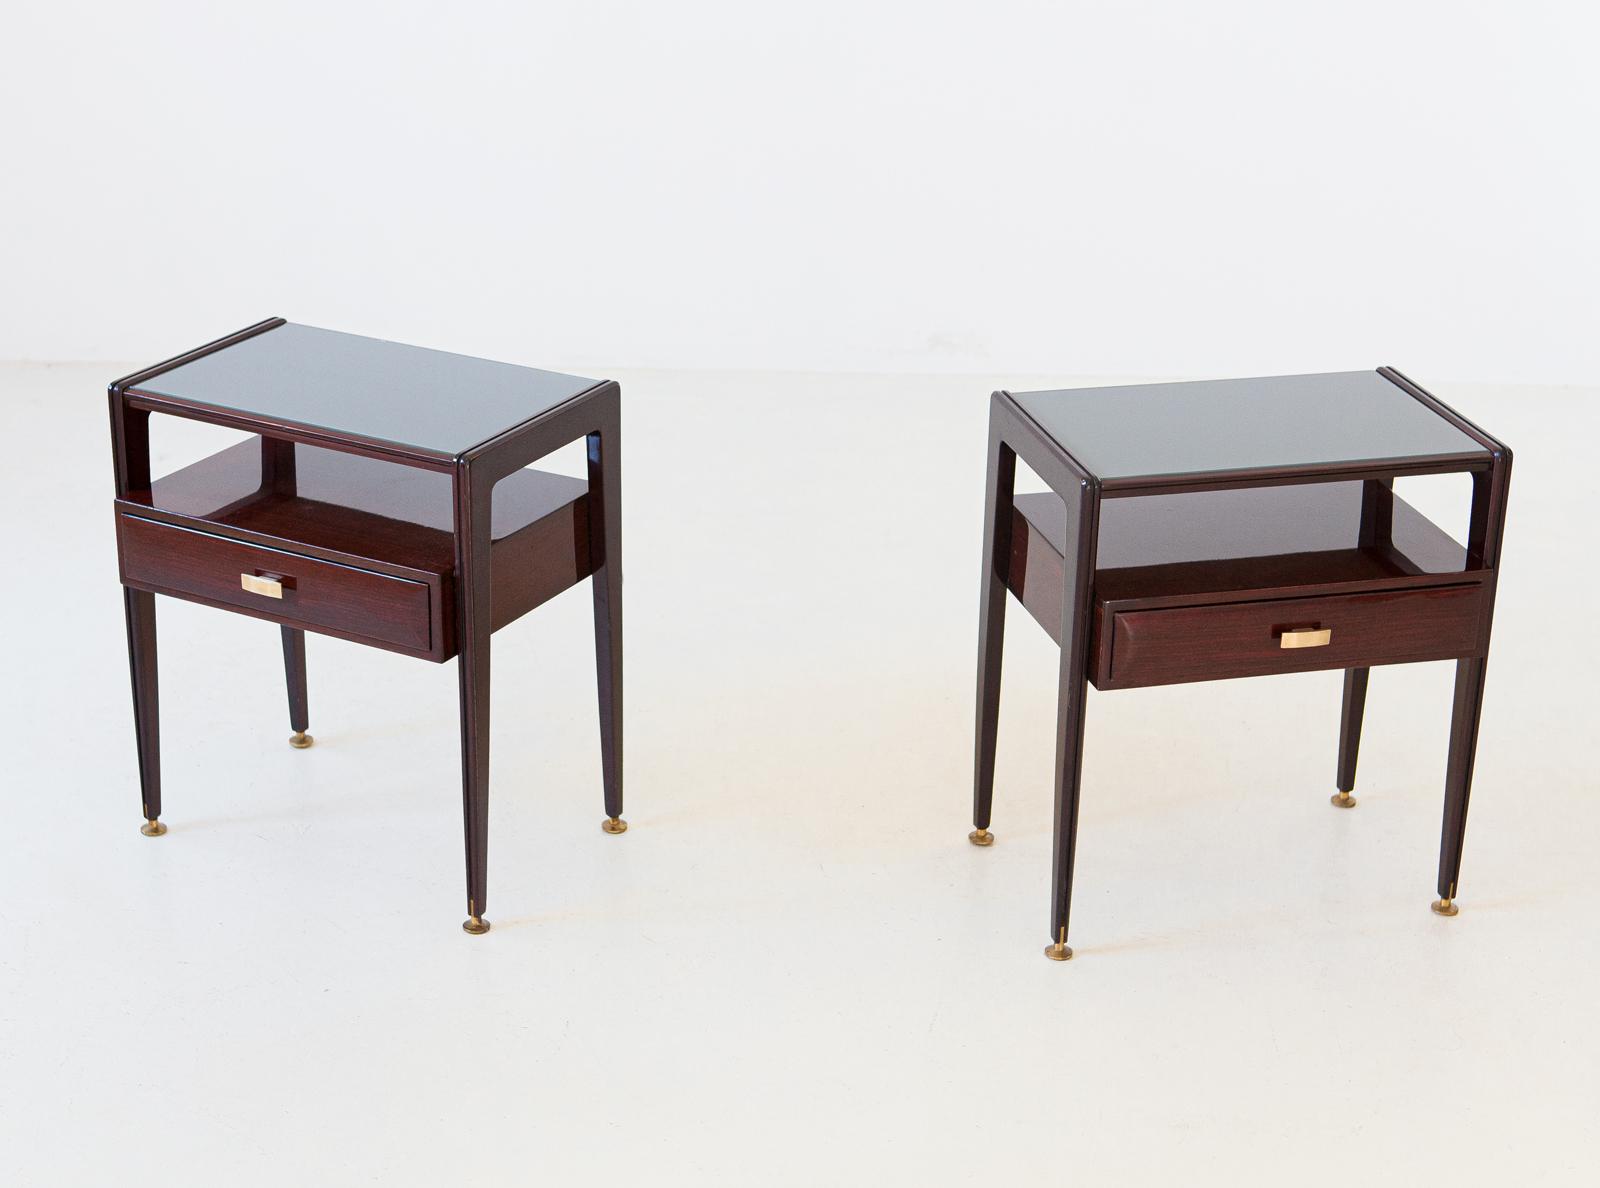 1950s-italian-nightstands-in-rosewood.with-glass-top-2-bt84